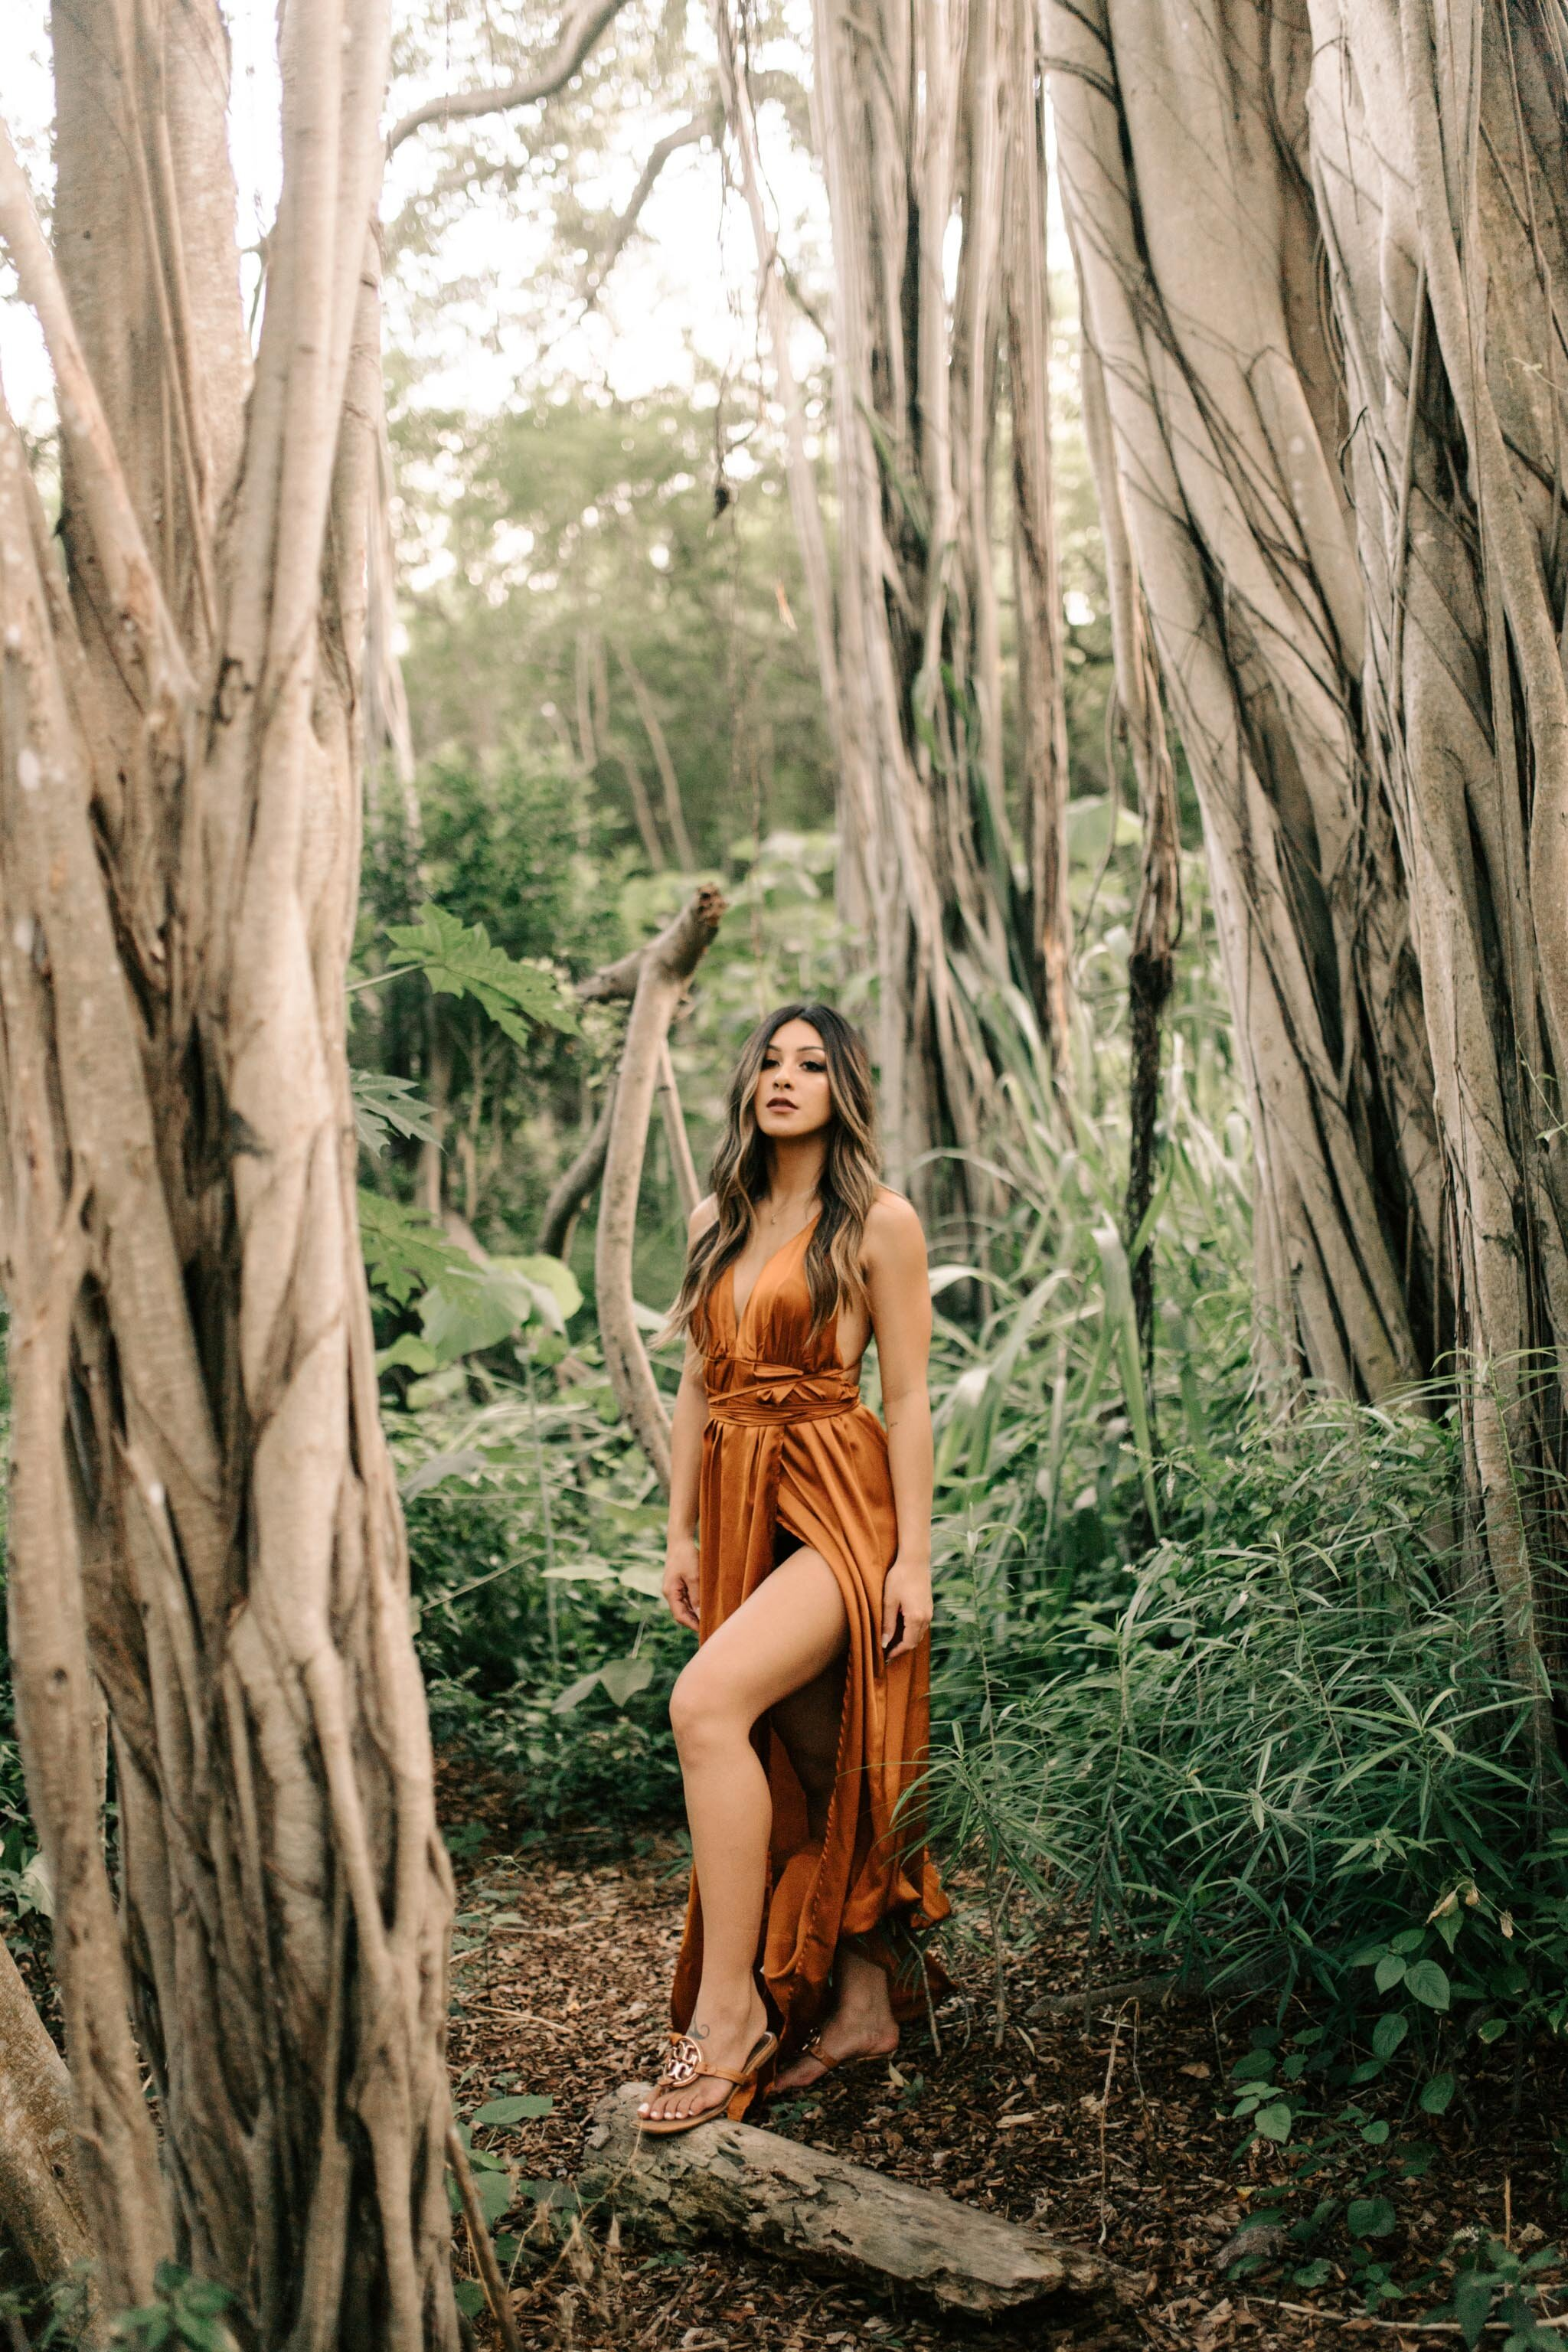 Jxnmama Birthday Photoshoot at Kawela Bay By Oahu Photographer Desiree Leilani